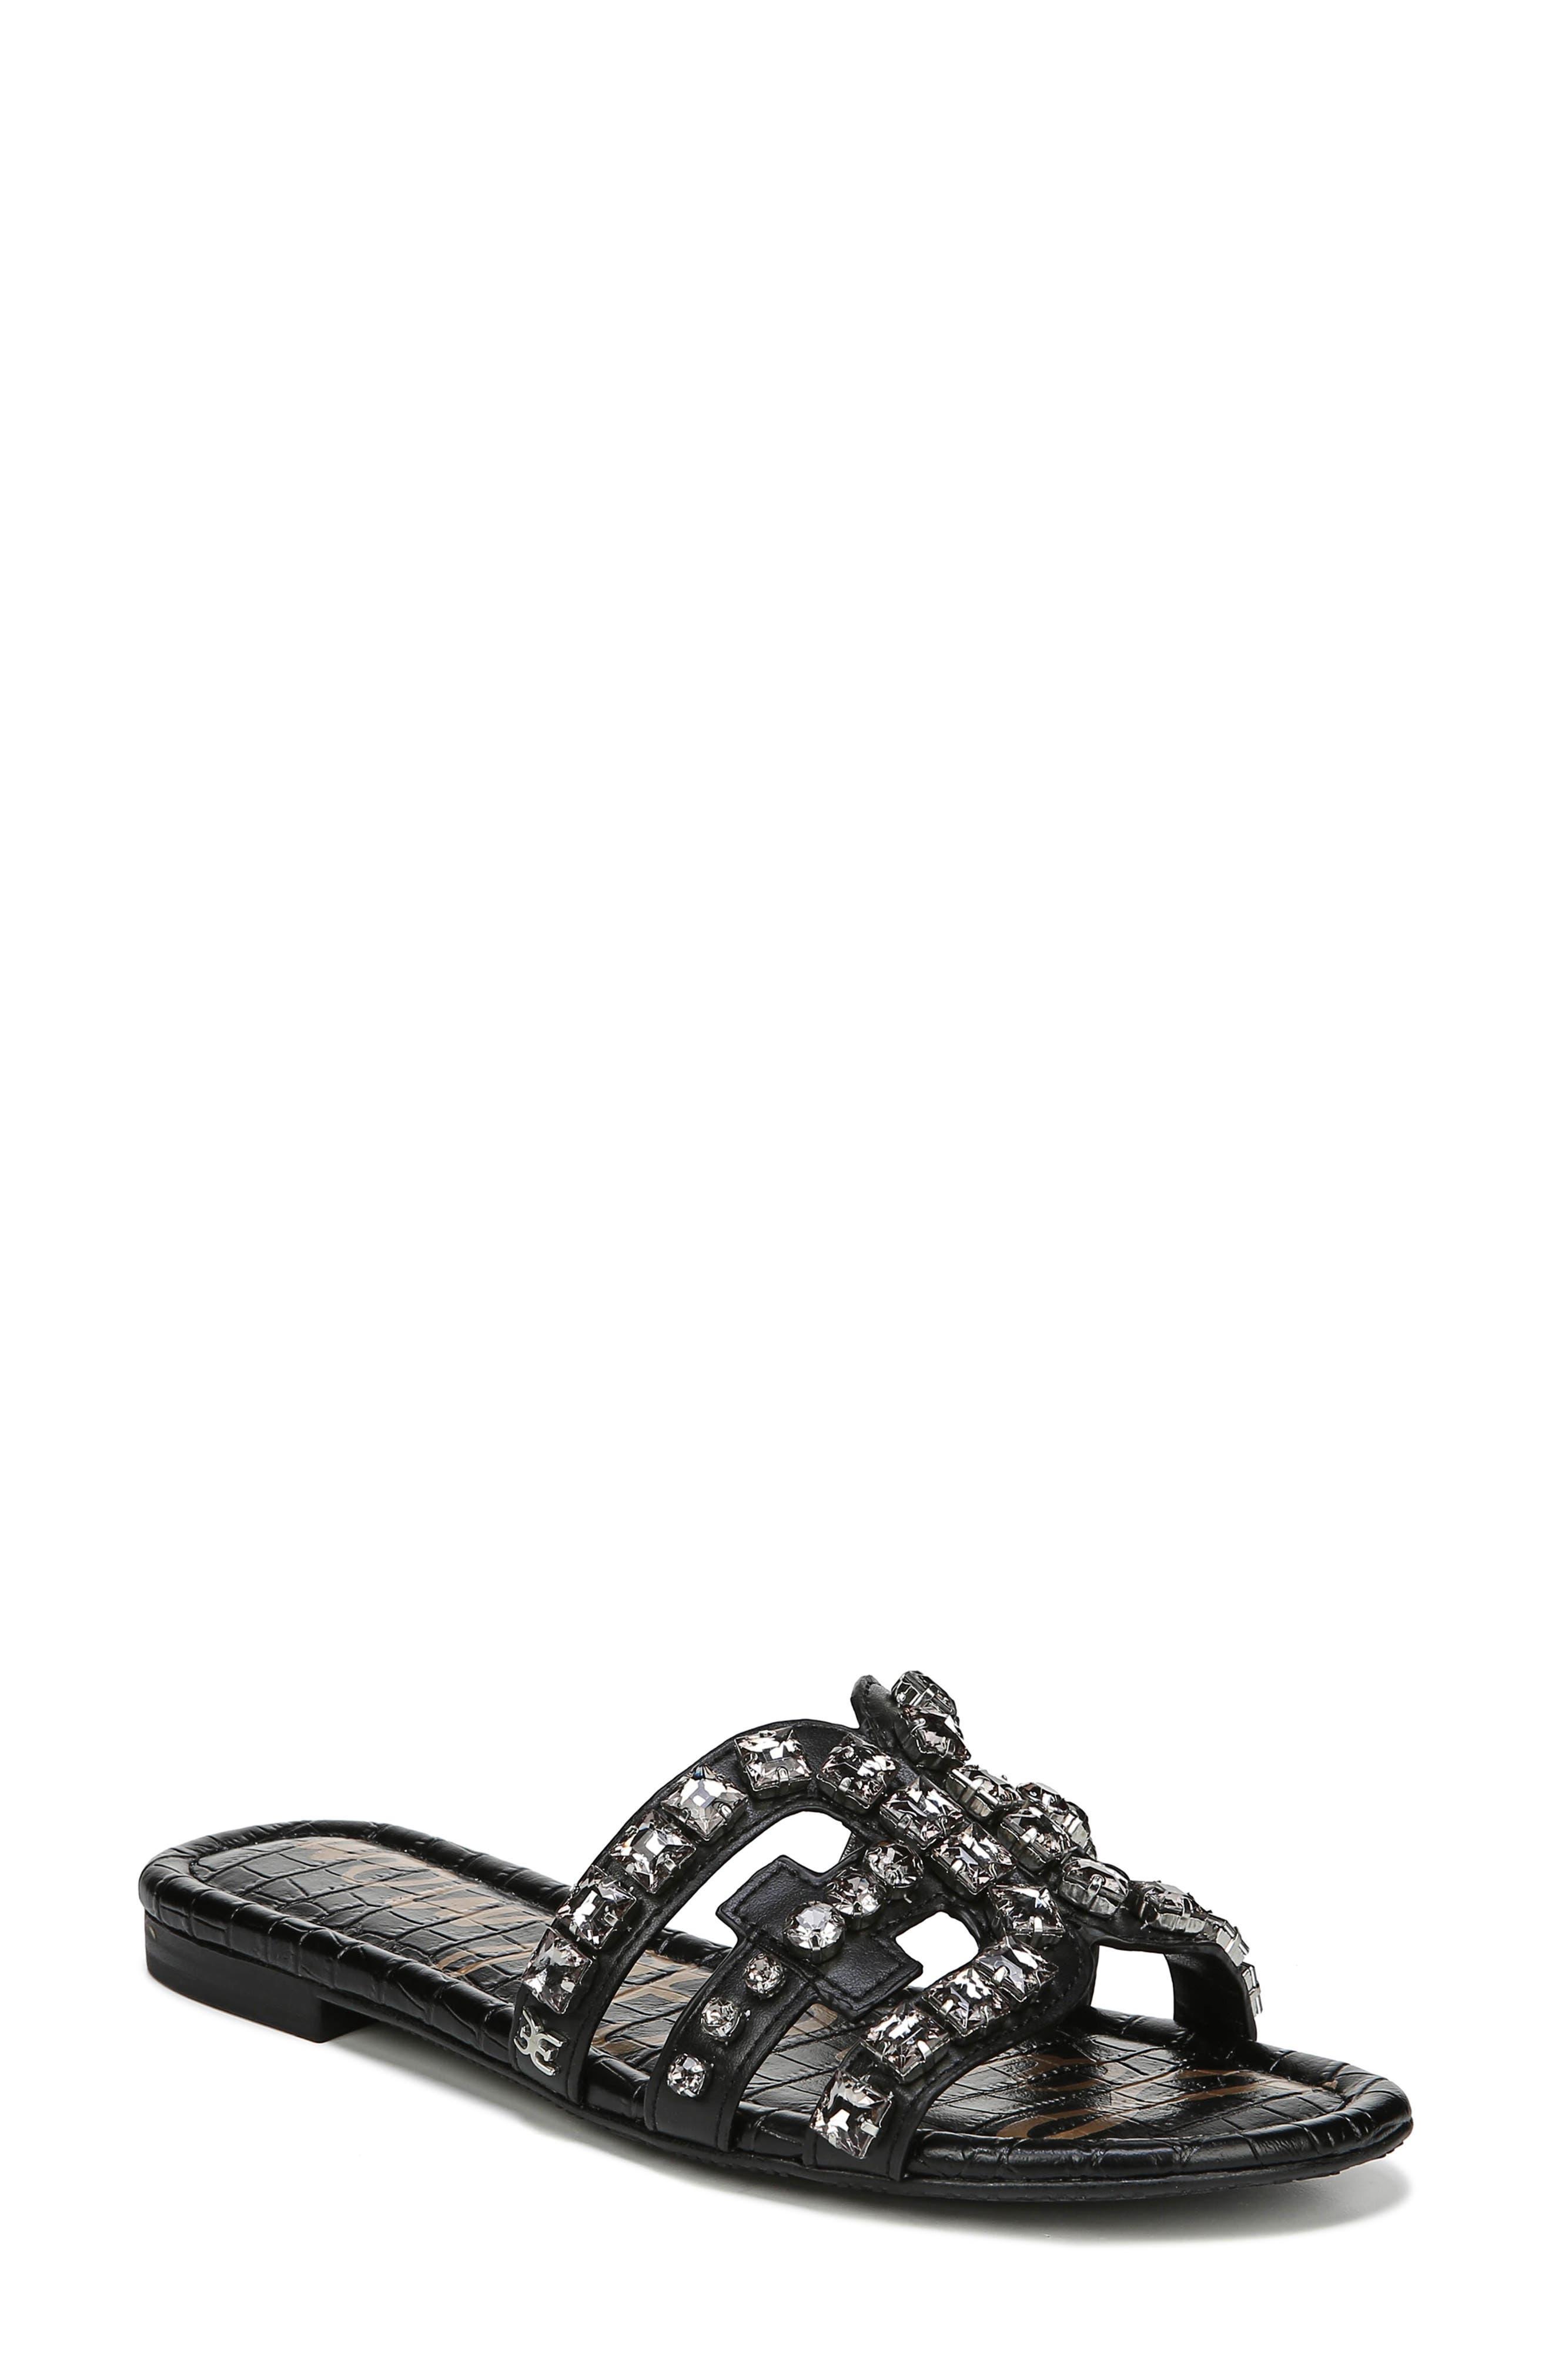 SAM EDELMAN, Bay 2 Embellished Slide Sandal, Main thumbnail 1, color, BLACK NAPPA LEATHER